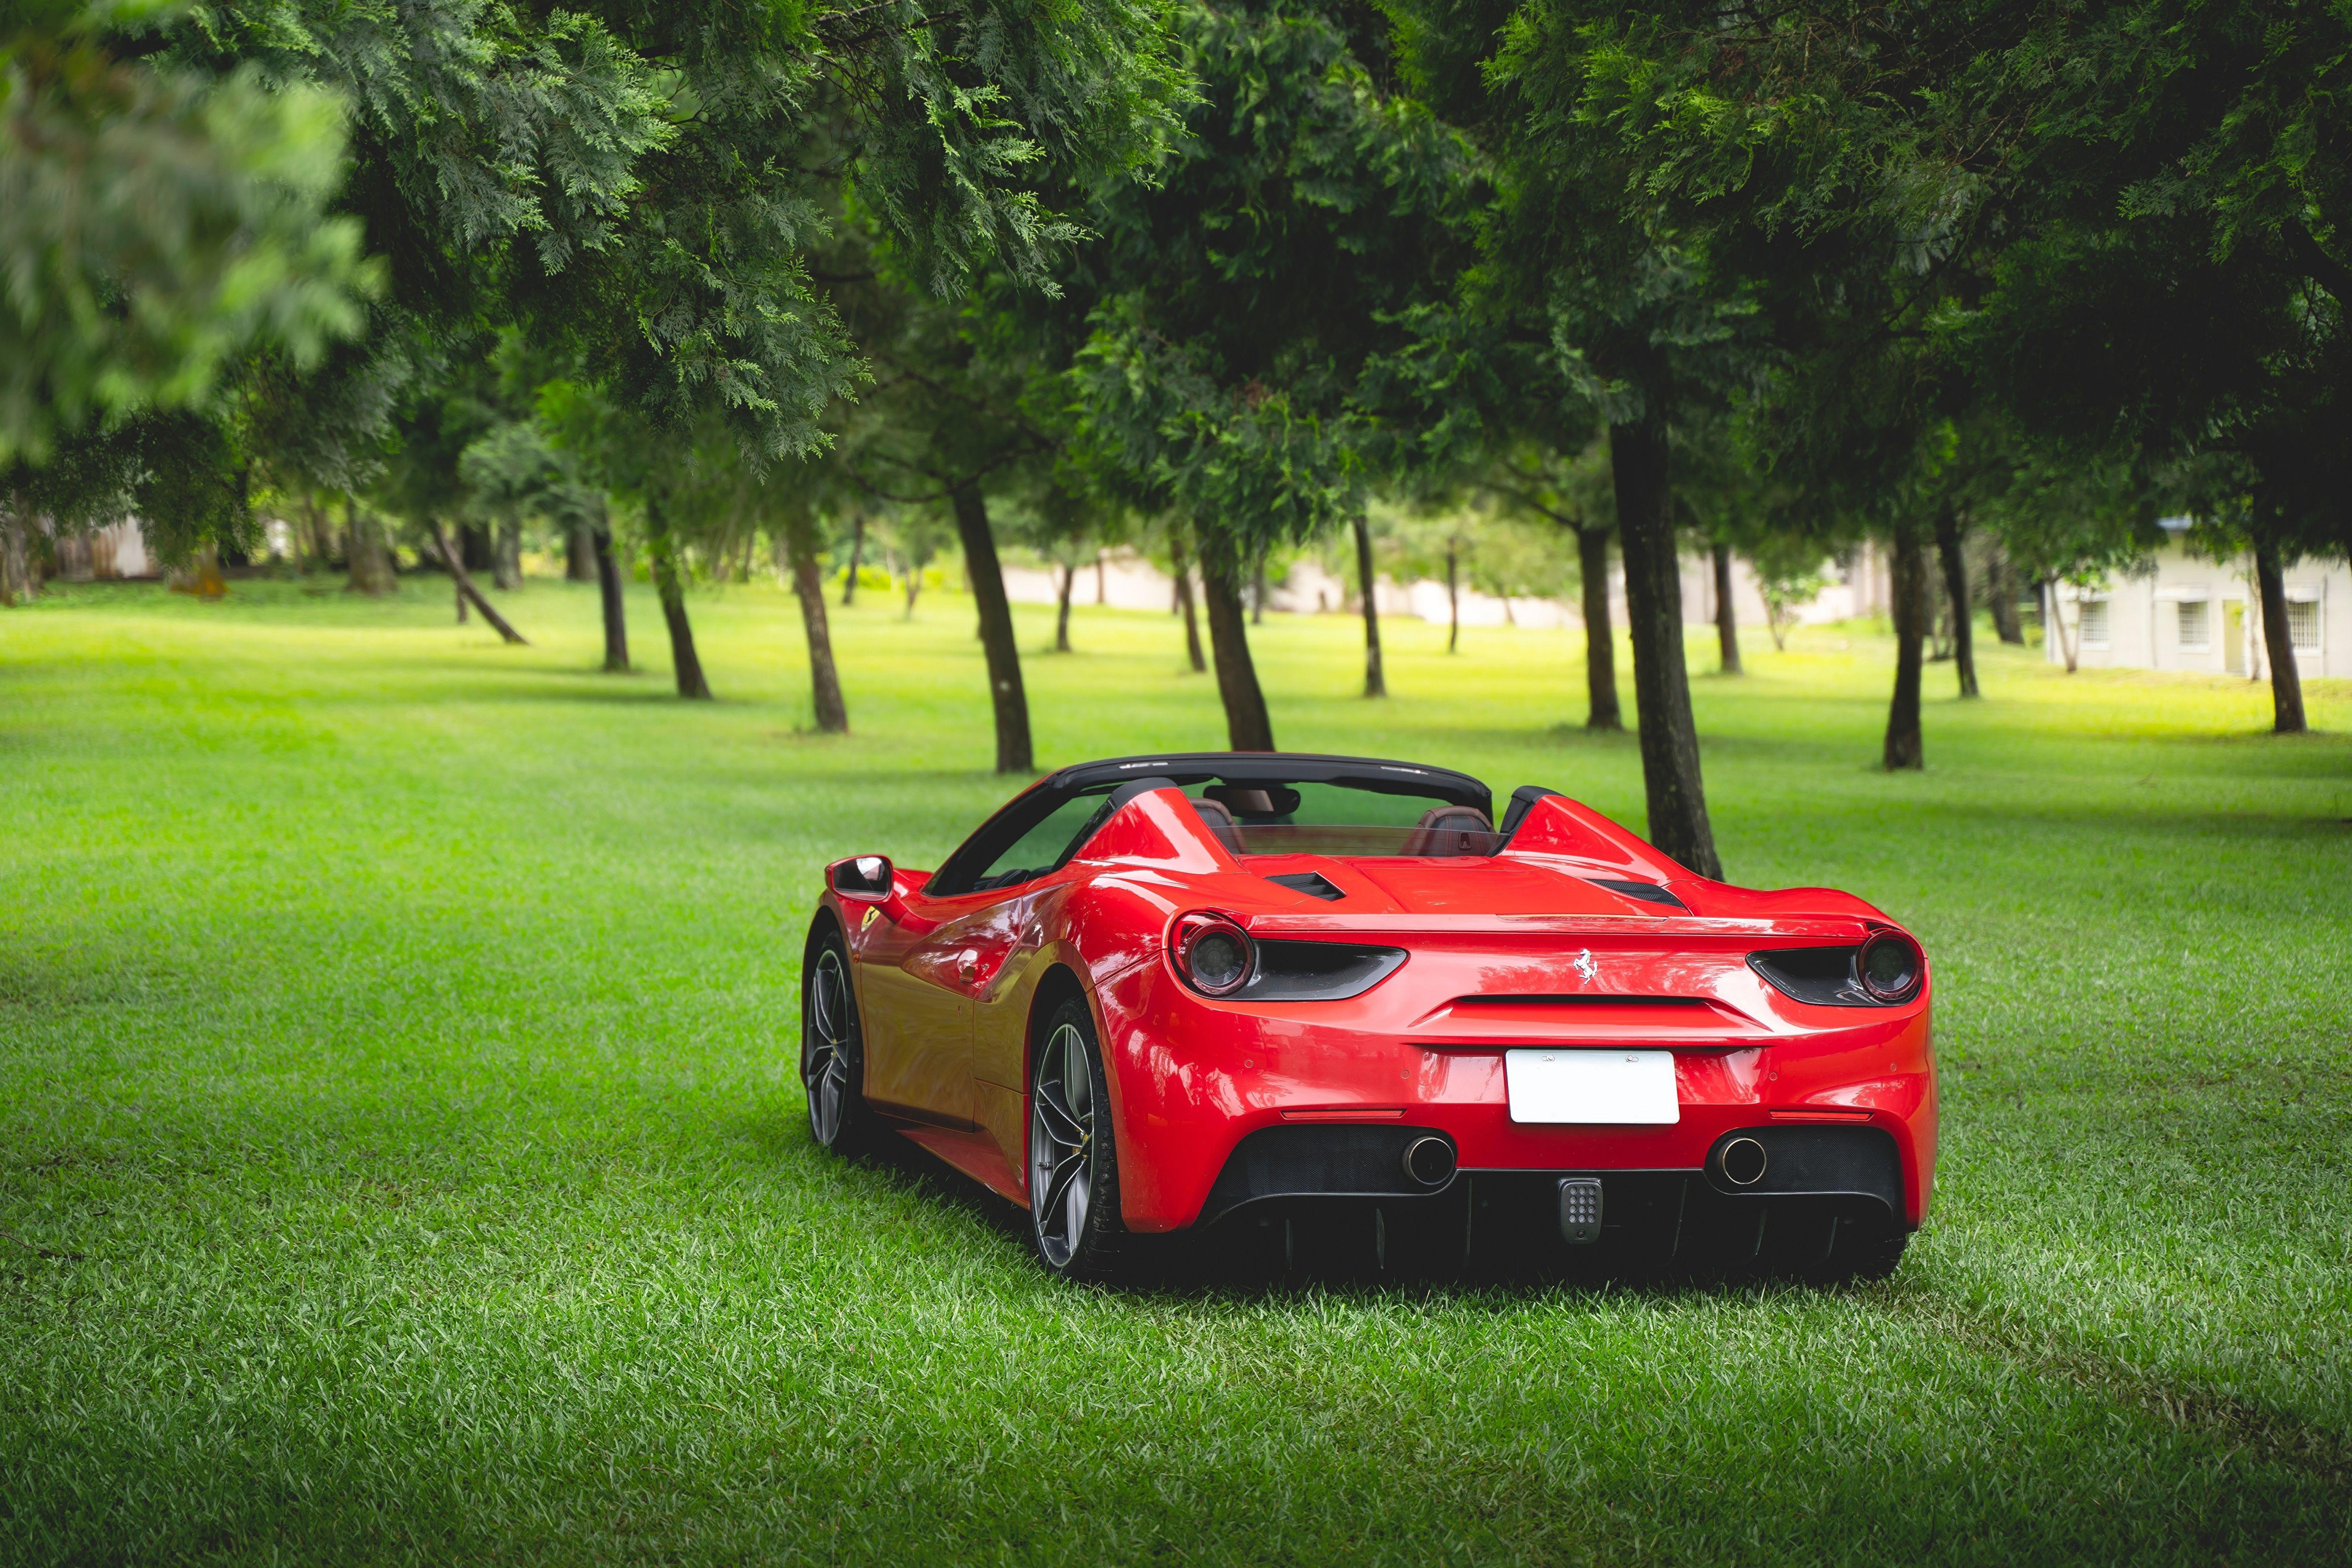 Ferrari 488 Spider Roadster 4k Ferrari 488 Spider Roadster 4k Wallpapers In 2021 Ferrari Ferrari 488 Spider Ferrari 488